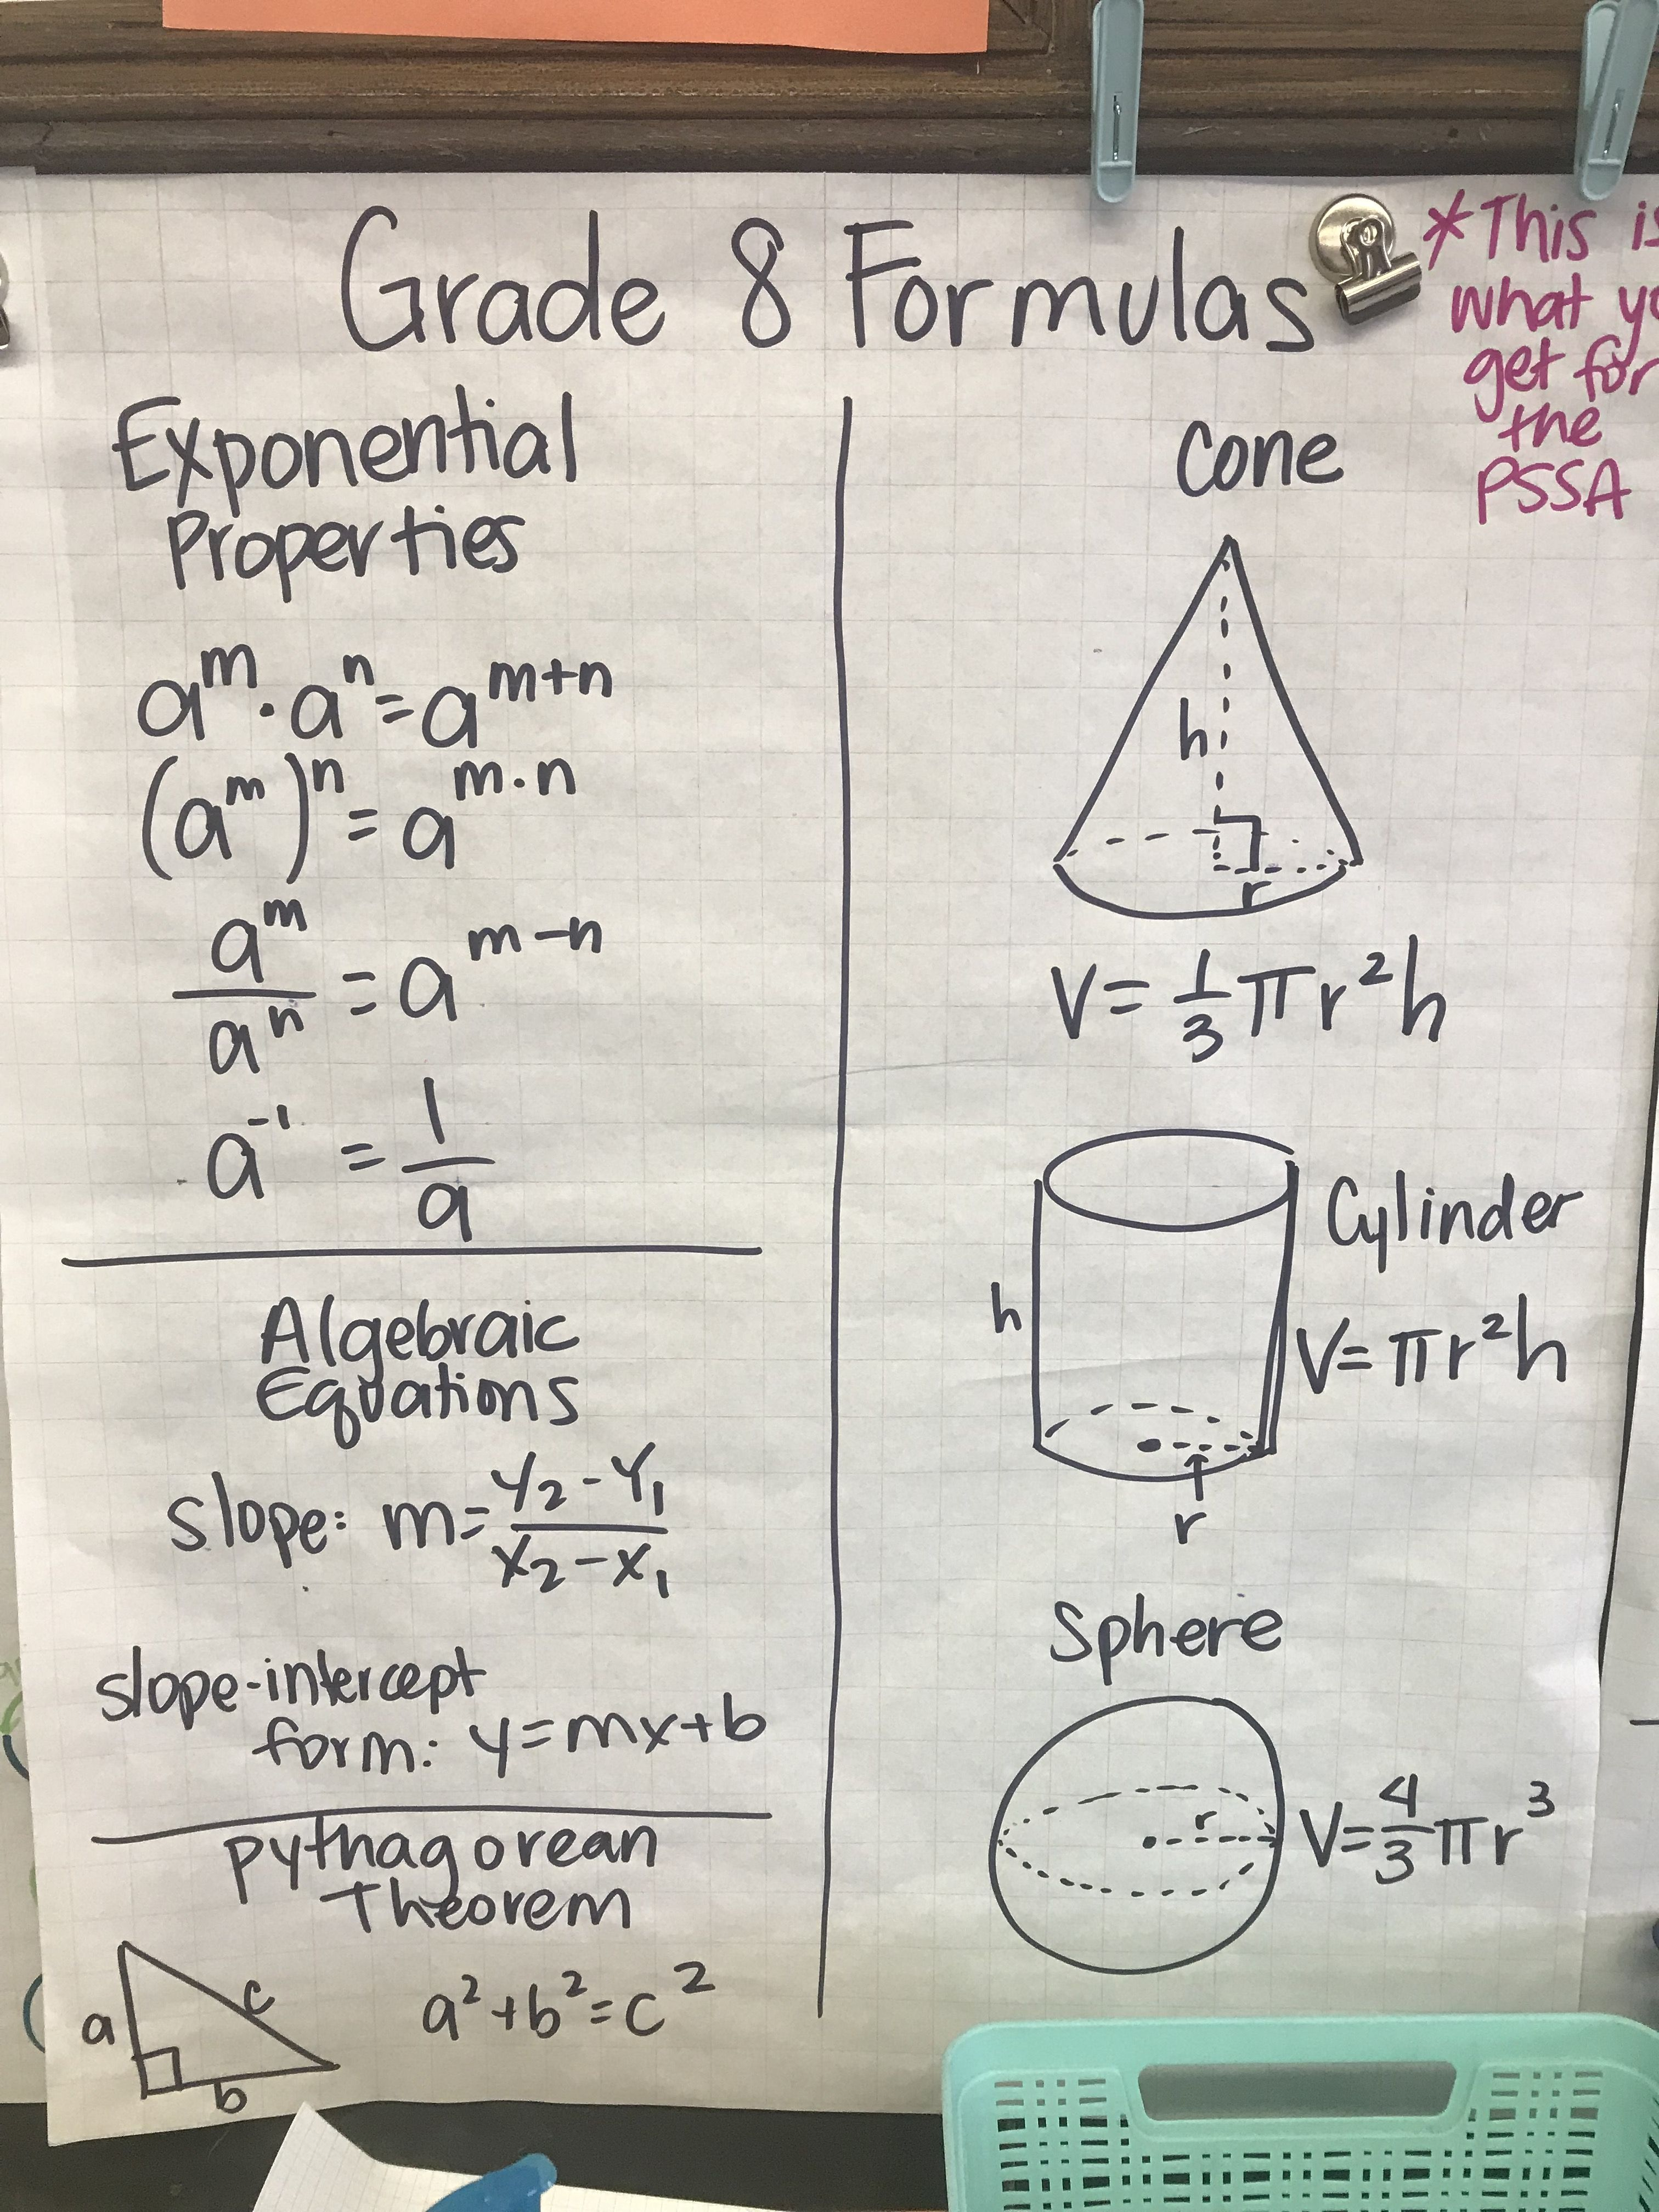 PSSA 8th Grade Formula Sheet anchor chart (photo only)   8th grade math [ 4032 x 3024 Pixel ]